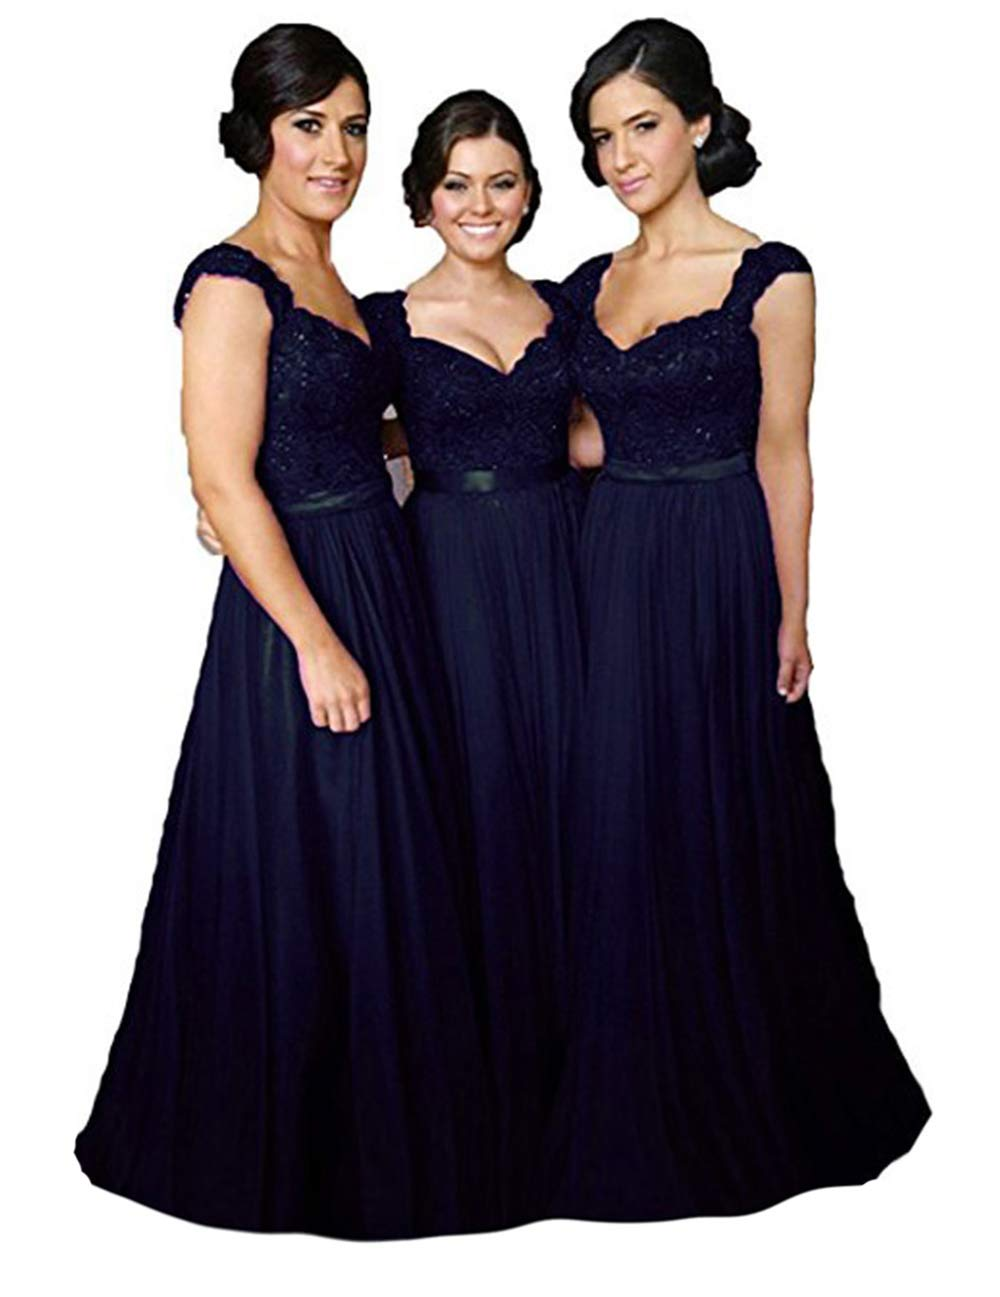 Fanciest Women Cap Sleeve Lace Bridesmaid Dresses Long Wedding Party Gowns Navy Blue Us16